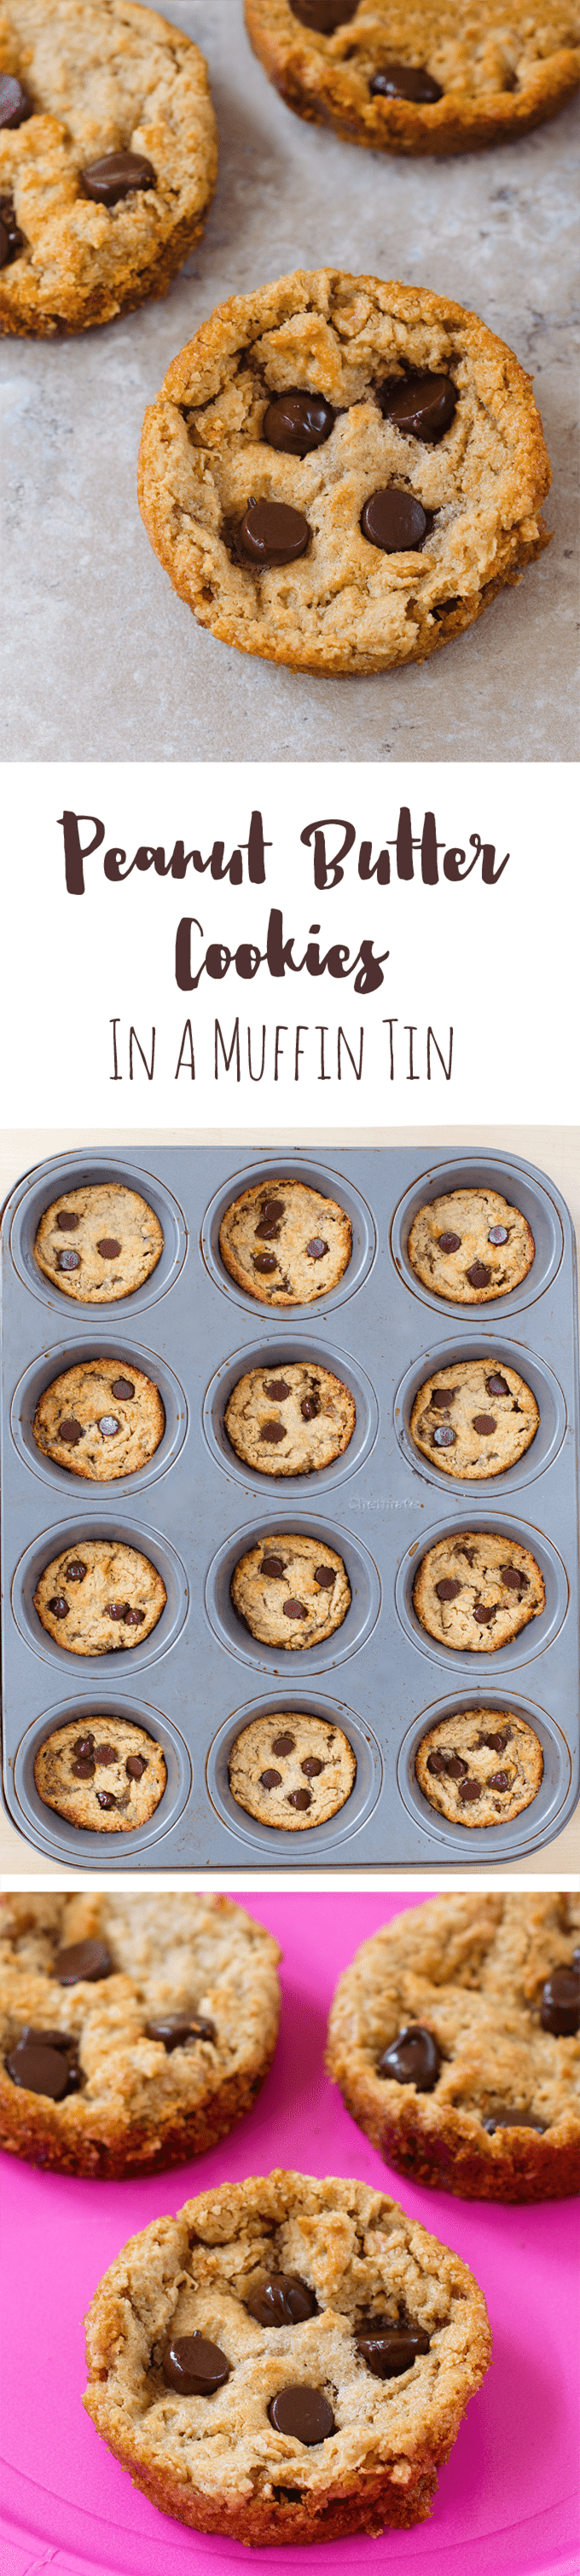 Peanut Butter Cookies - Ingredients: 1/2 cup peanut butter, 1/2 tsp vanilla extract, 1/4 tsp baking soda, 2 tbsp... Full recipe: https://chocolatecoveredkatie.com/2016/08/01/peanut-butter-cookies-muffin-tin/ @choccoveredkt